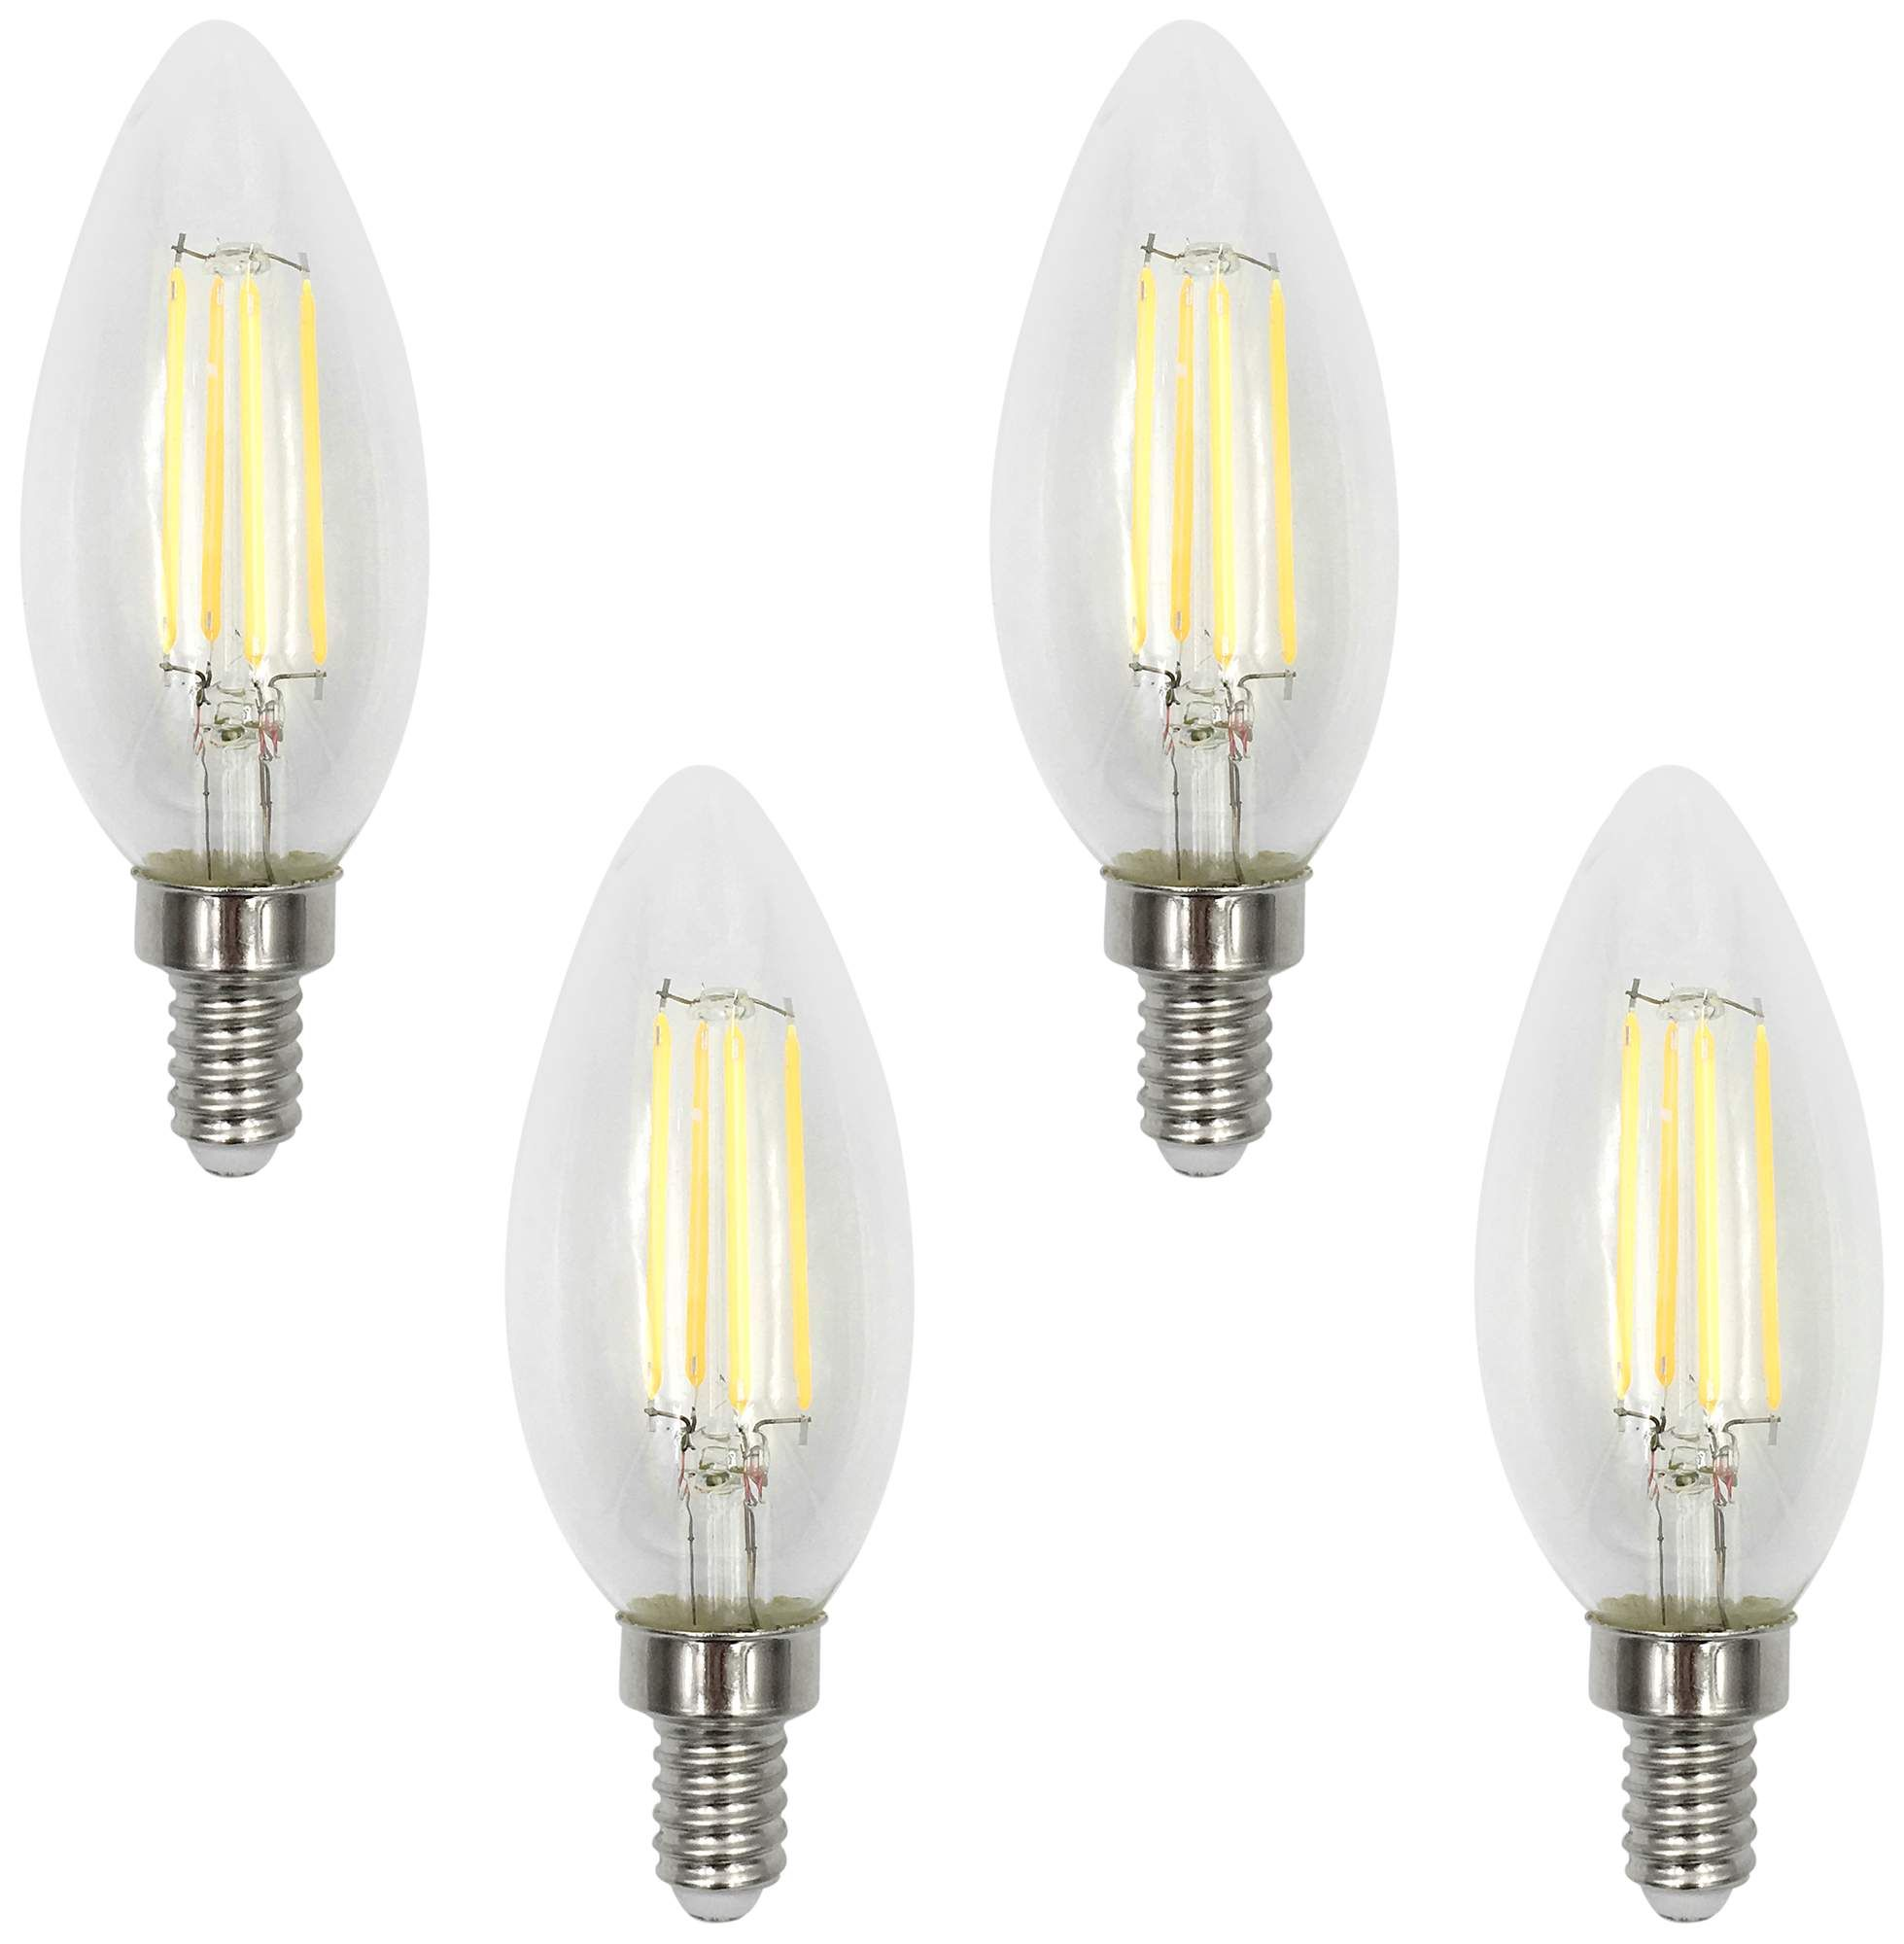 60w Equivalent Torpedo 6w Led Filament Candelabra 4 Pack Light Bulb Lamp Bulb